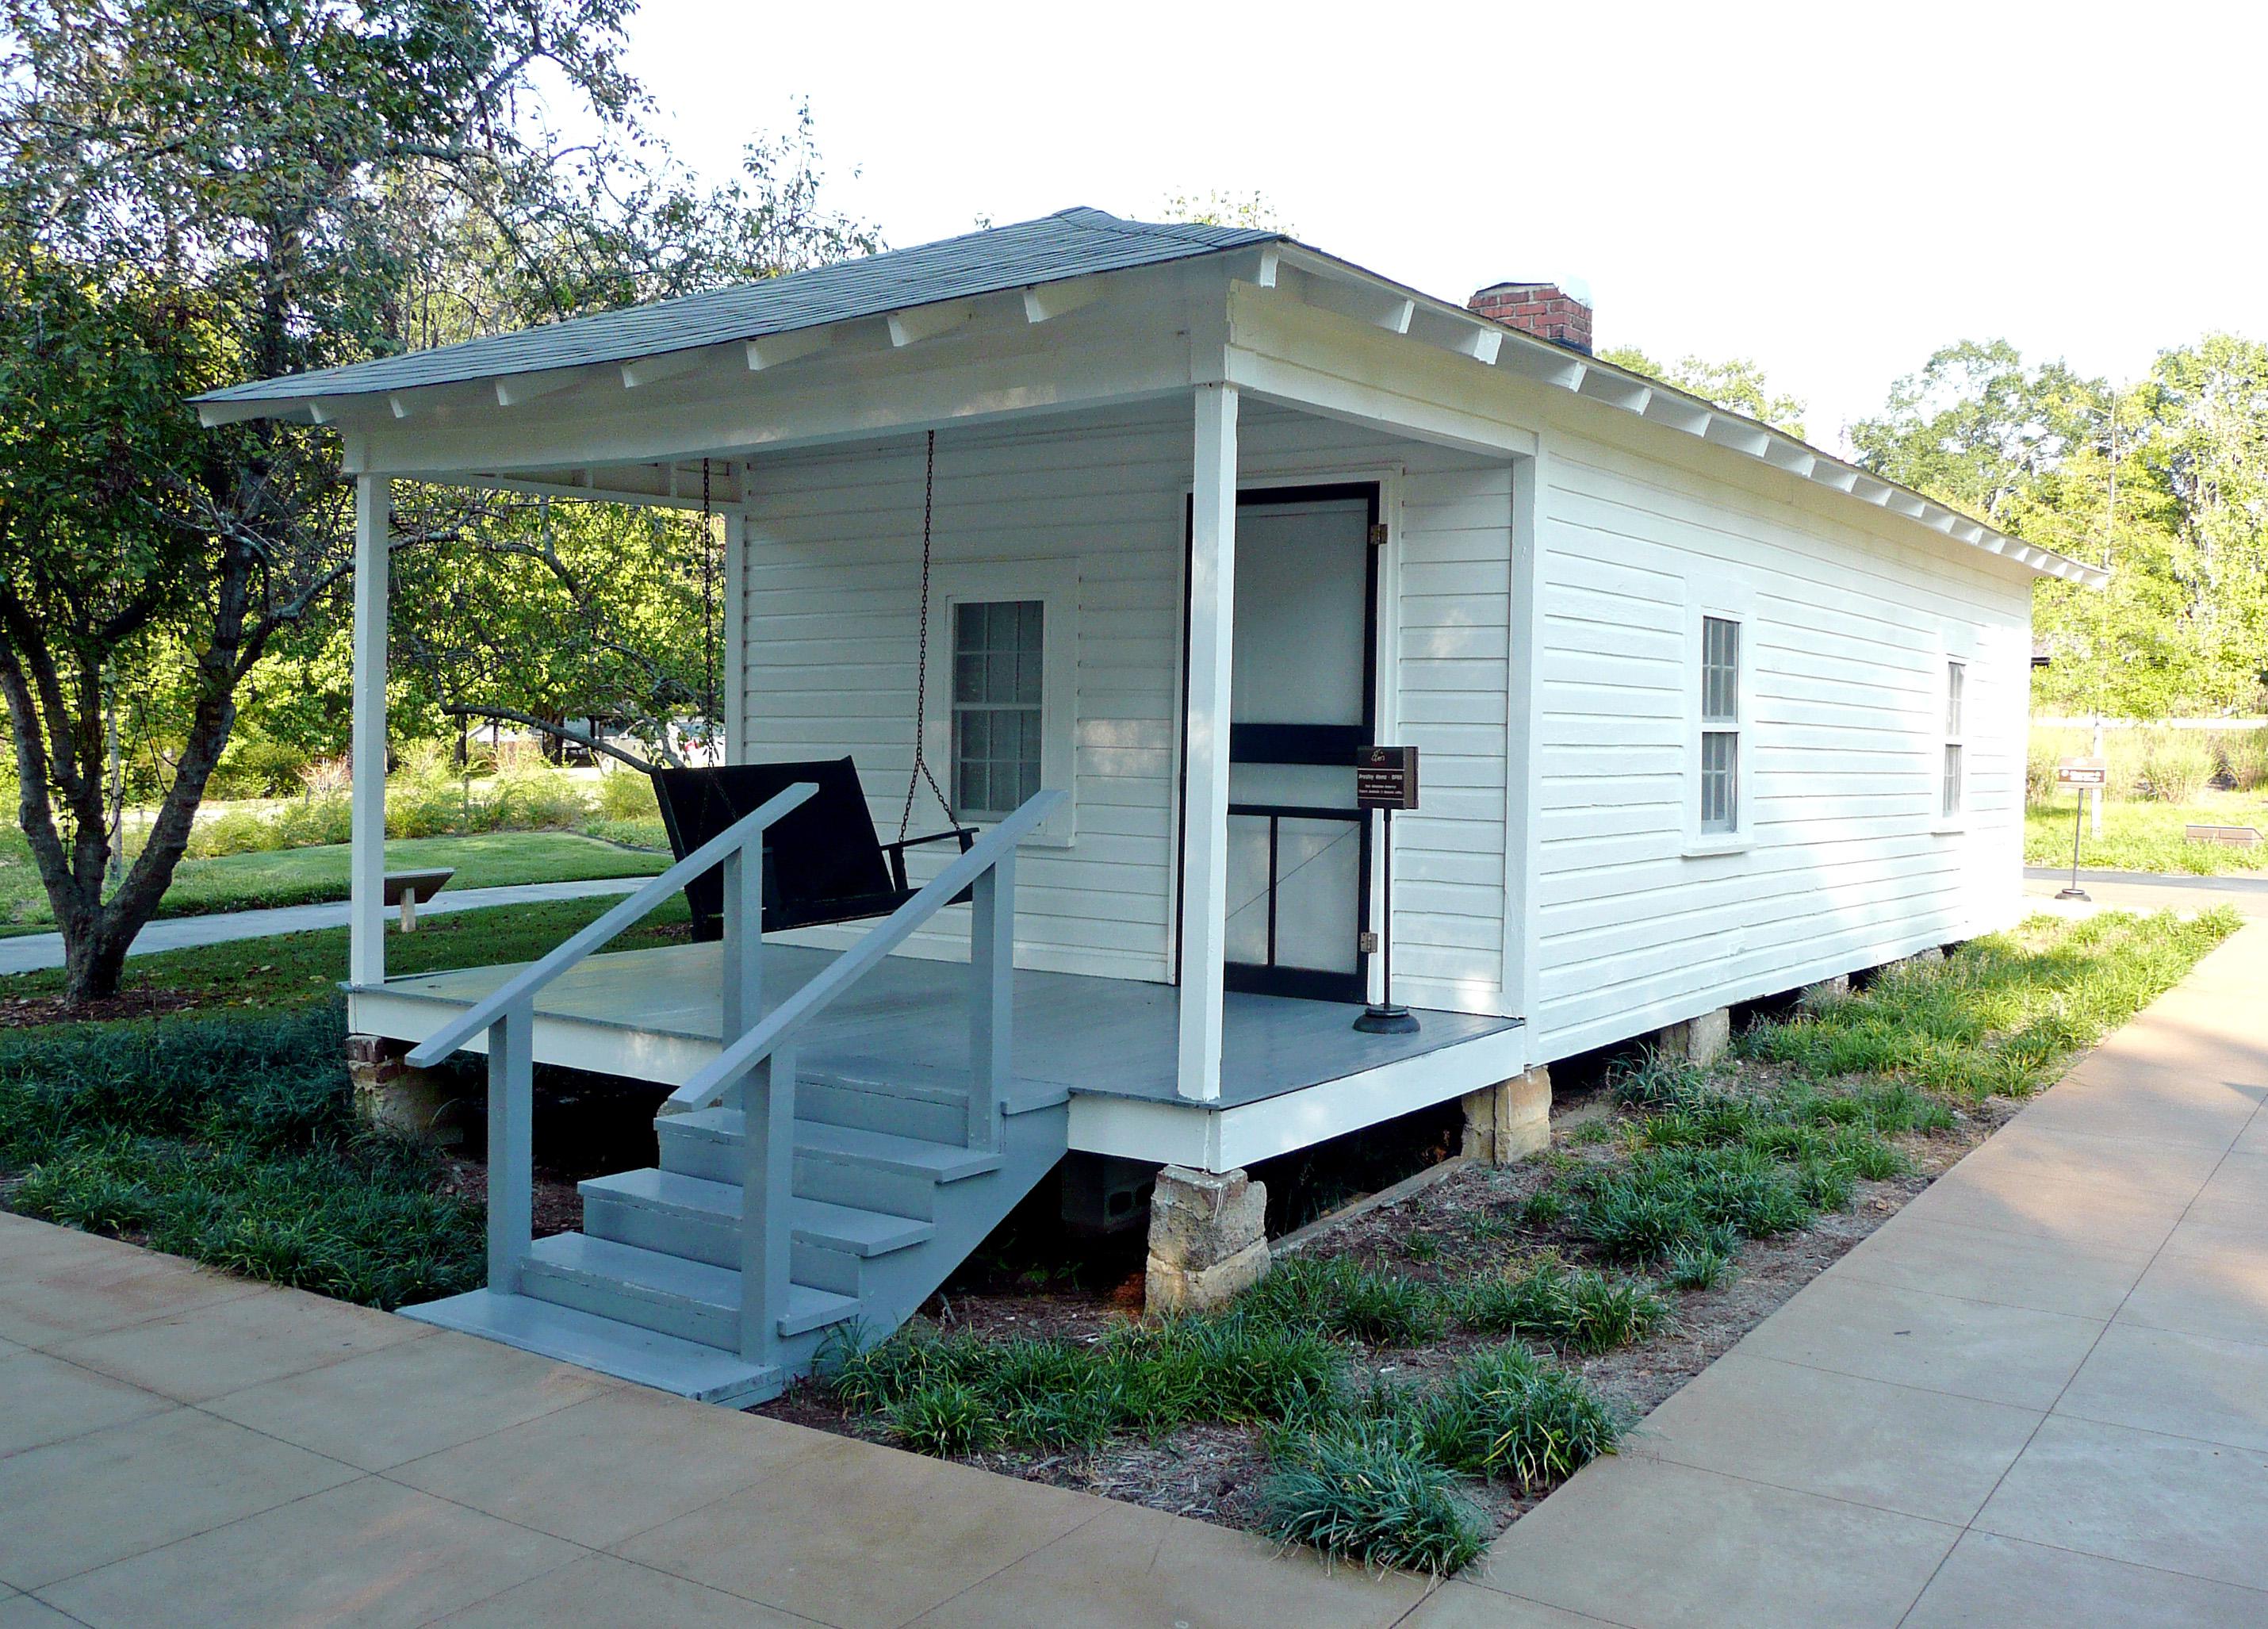 File:Elvis' birthplace Tupelo, MS 2007.jpg - Wikimedia Commons